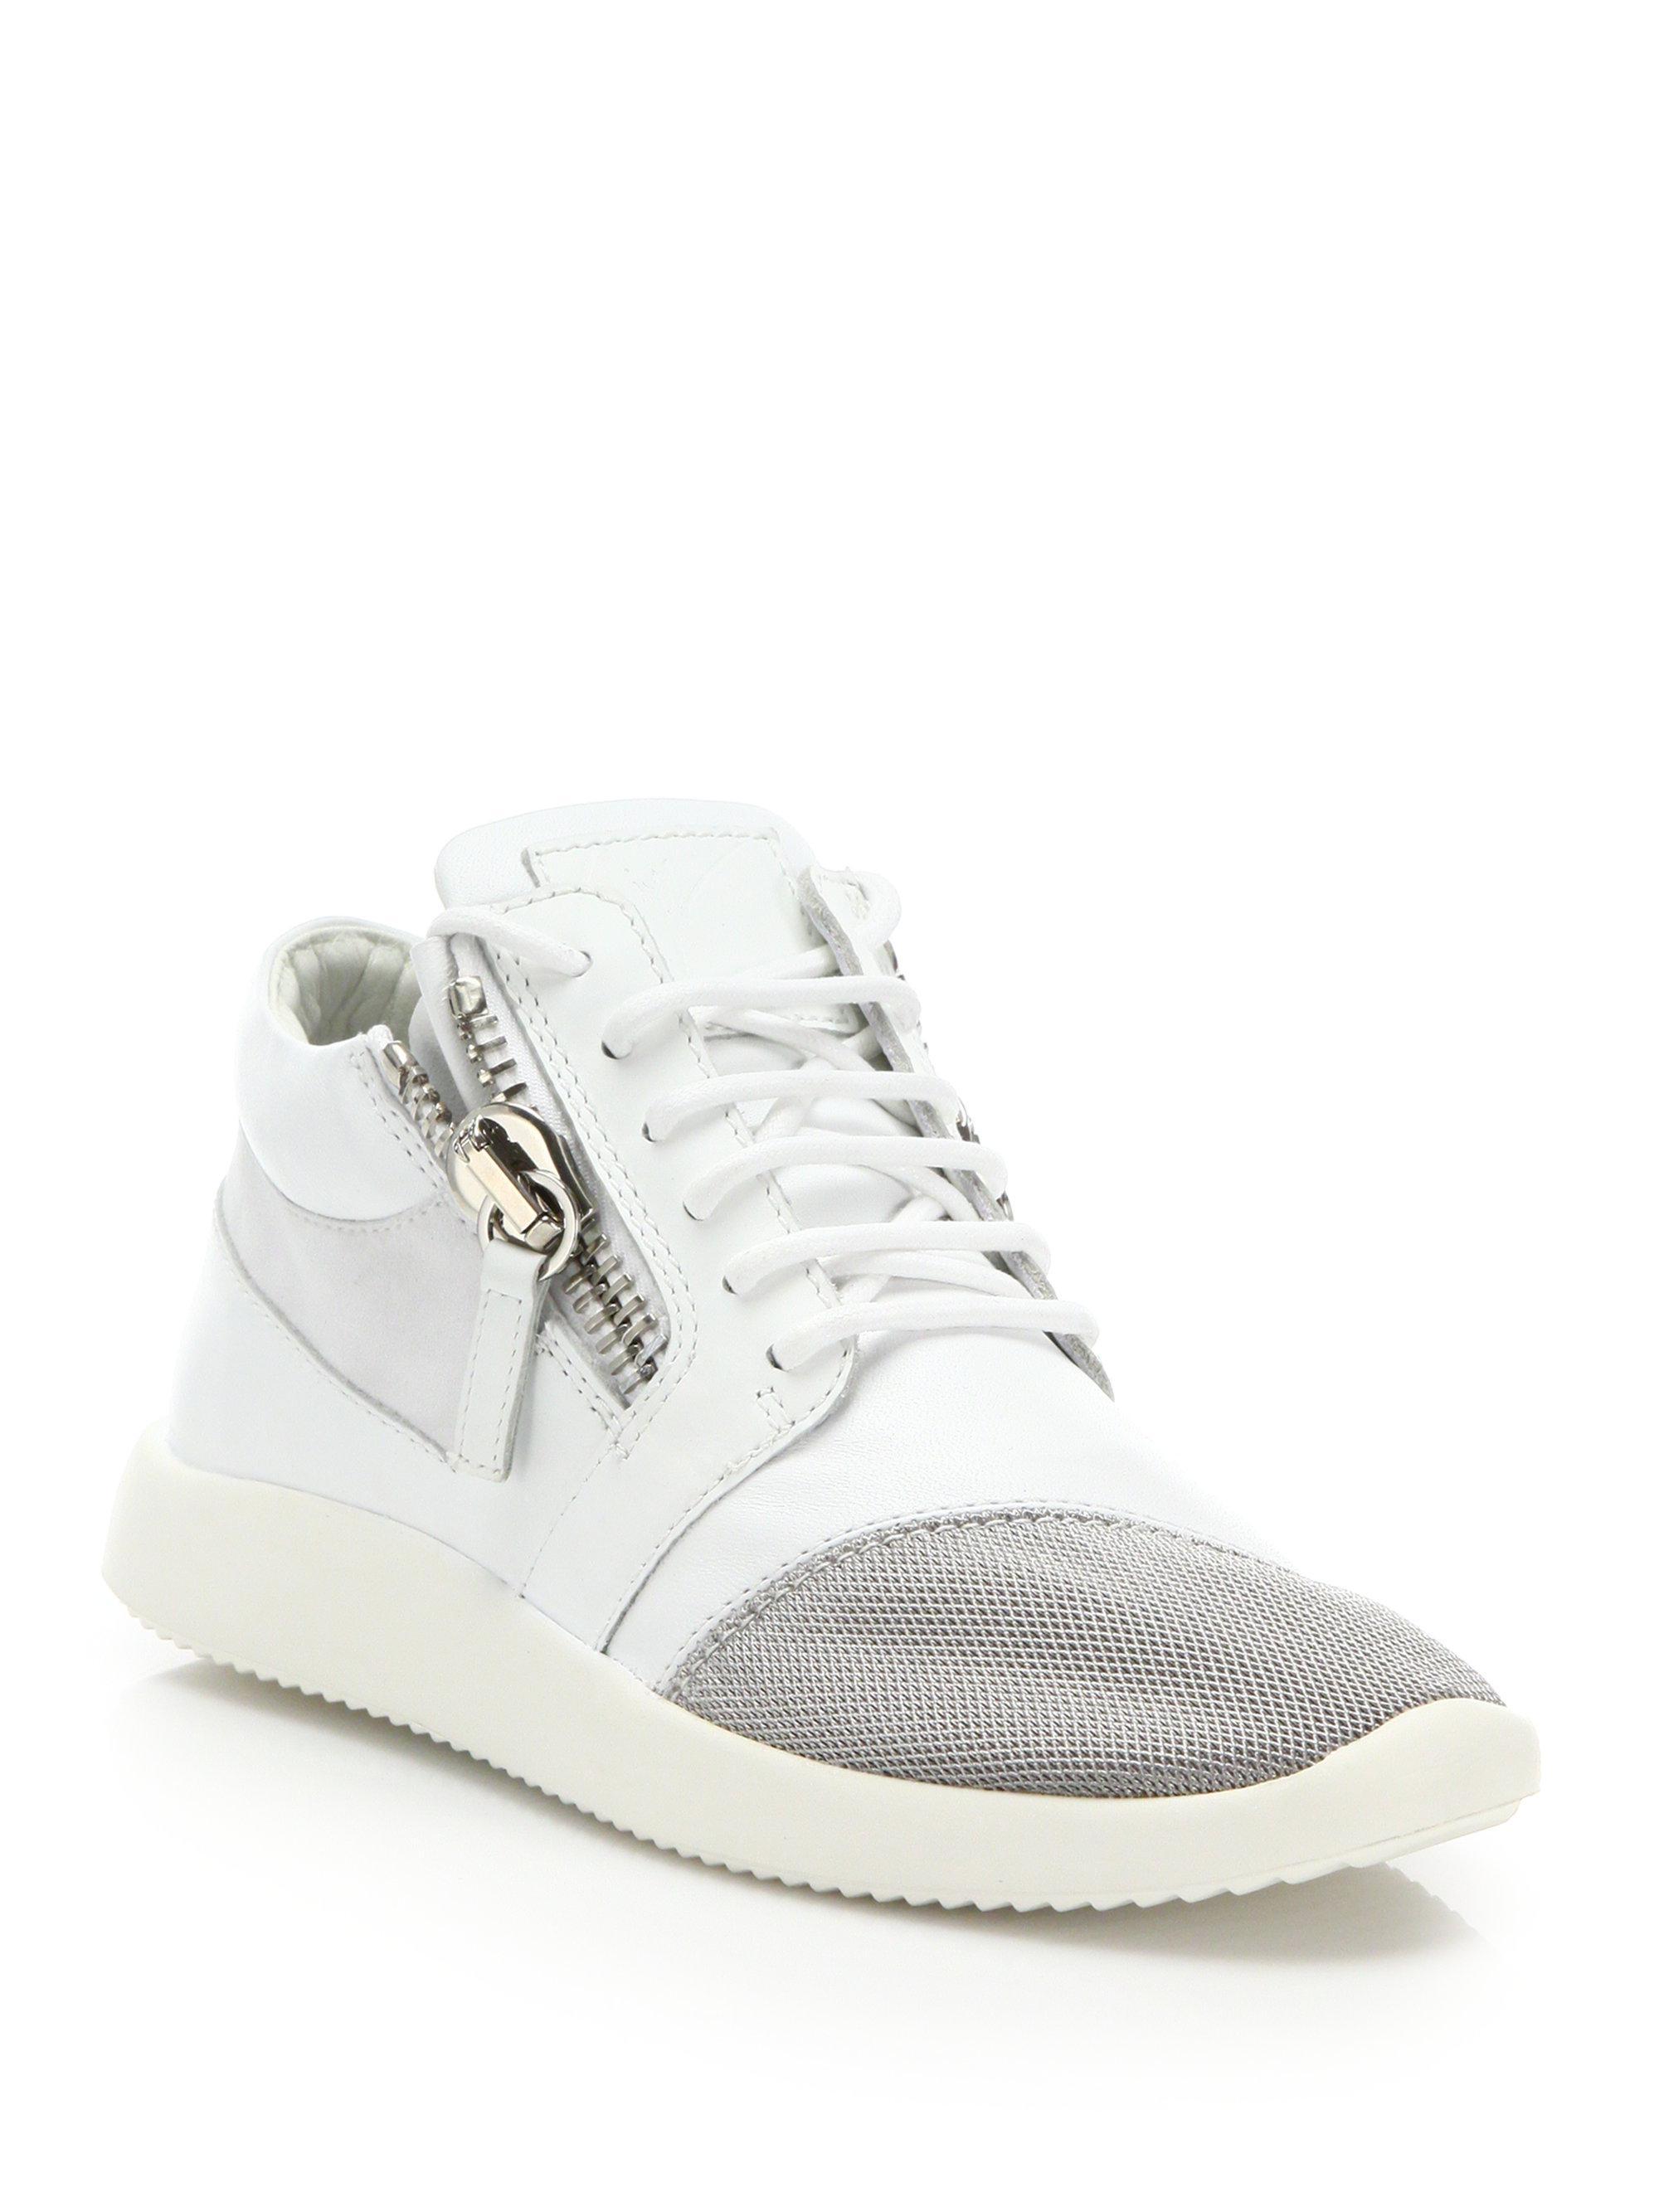 Giuseppe Zanotti Leather & Mesh Side-Zip Sneakers AQfMx